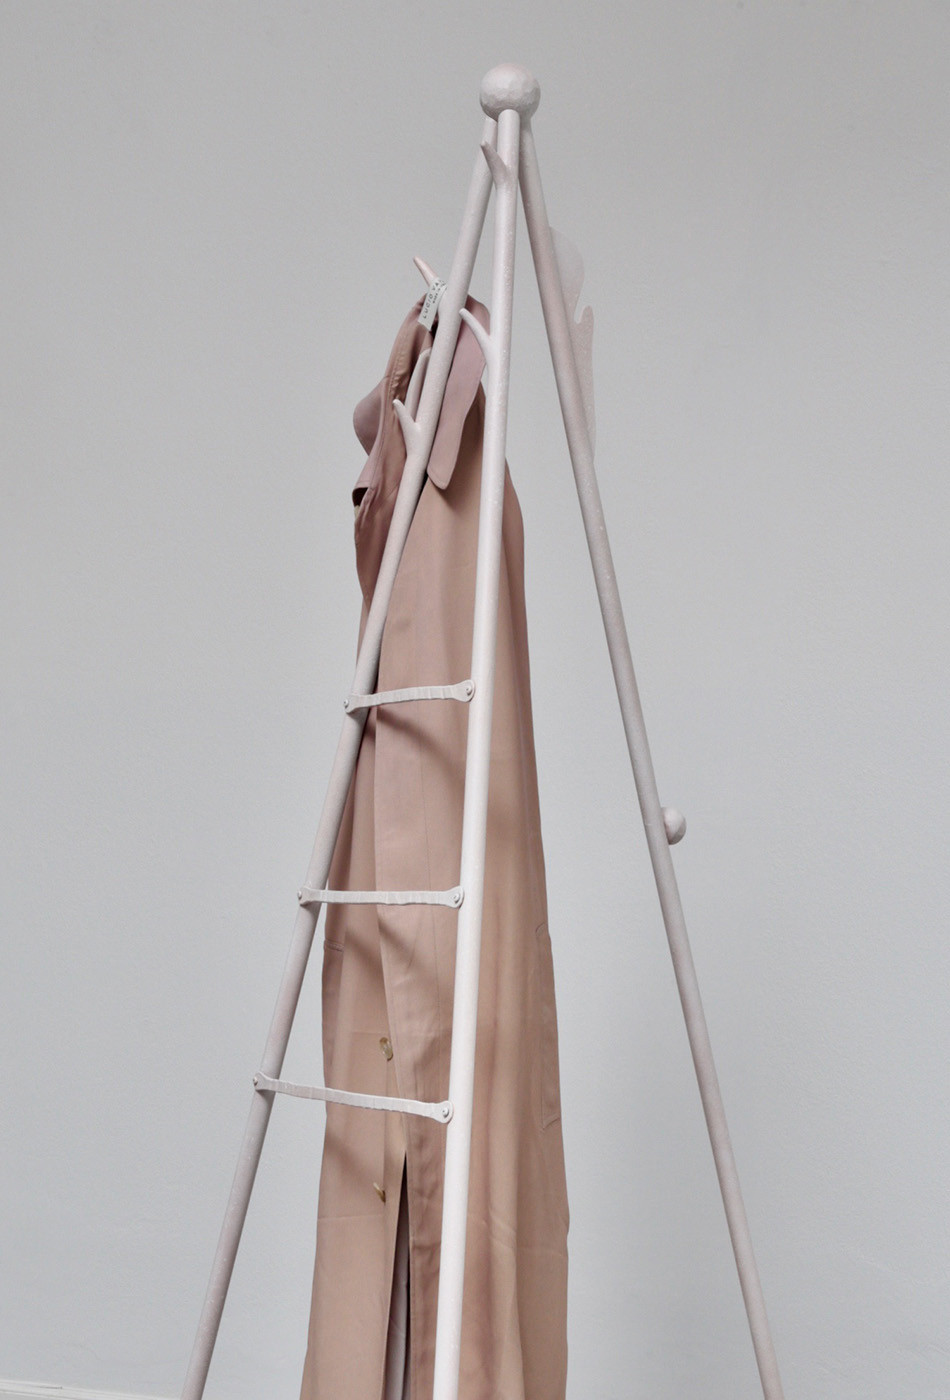 coat-hanging-on-elements.jpg